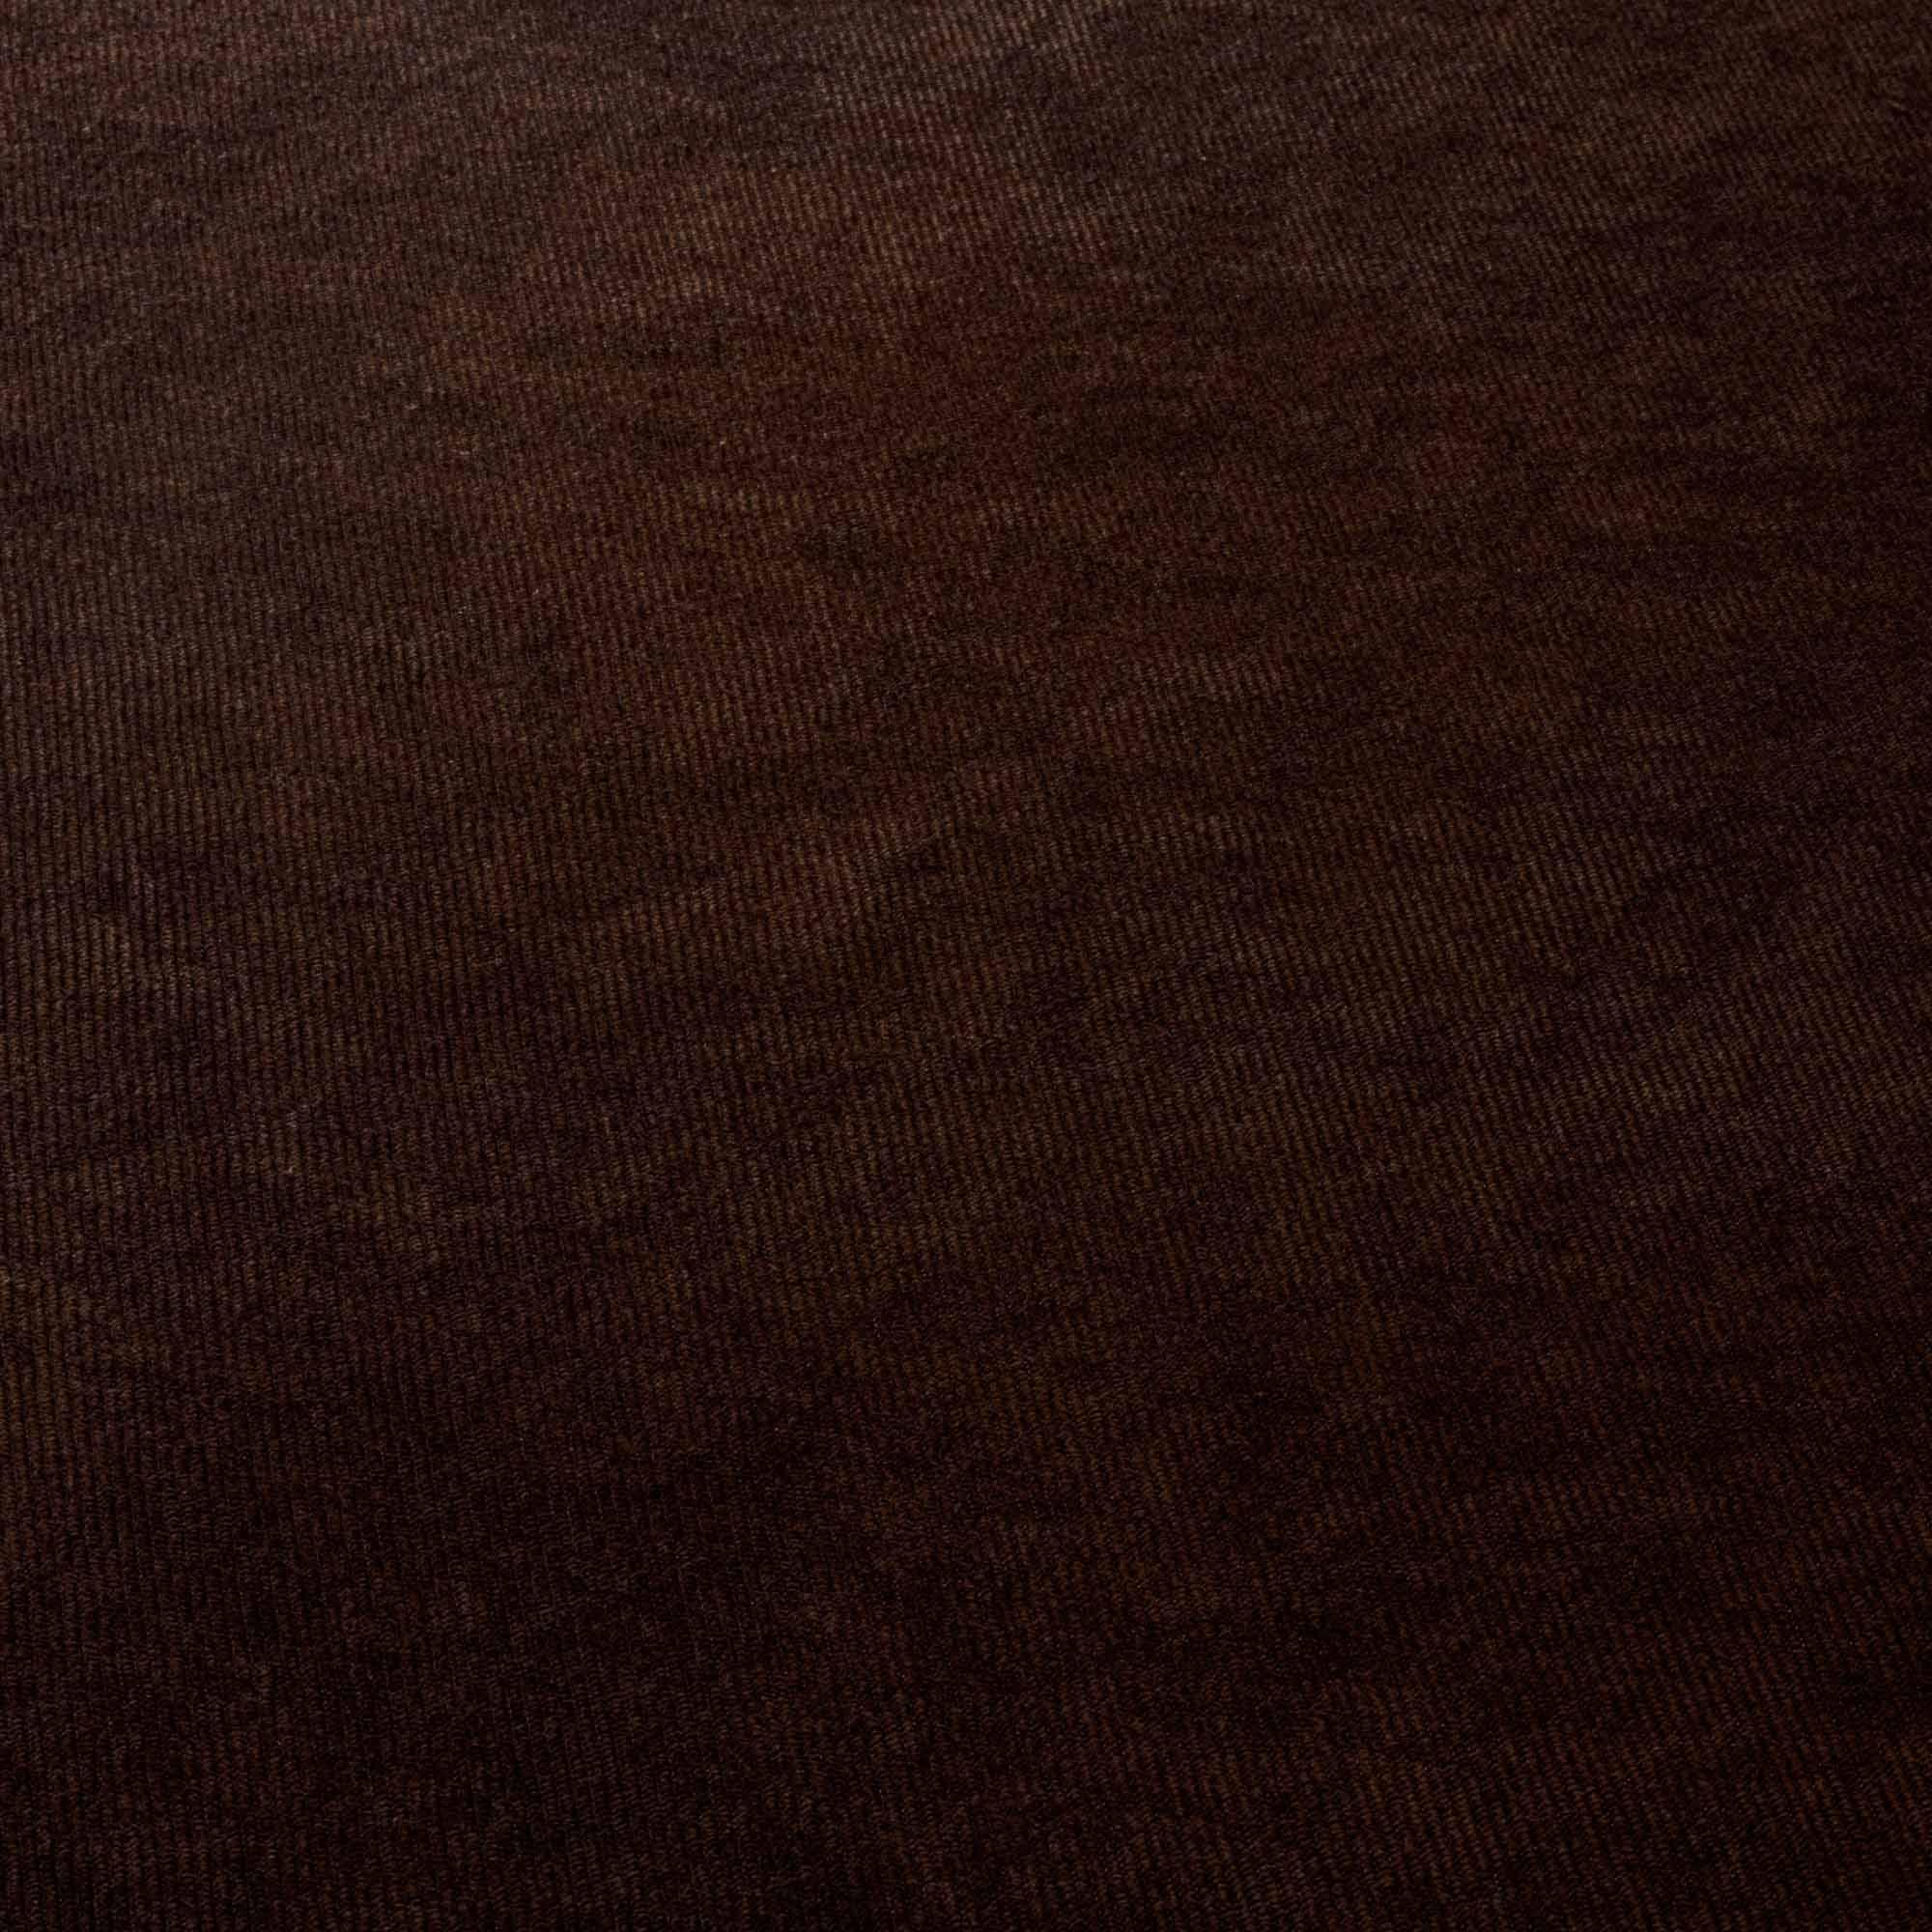 Tecido Veludo Cotele Marrom 1,40 Mt Largura